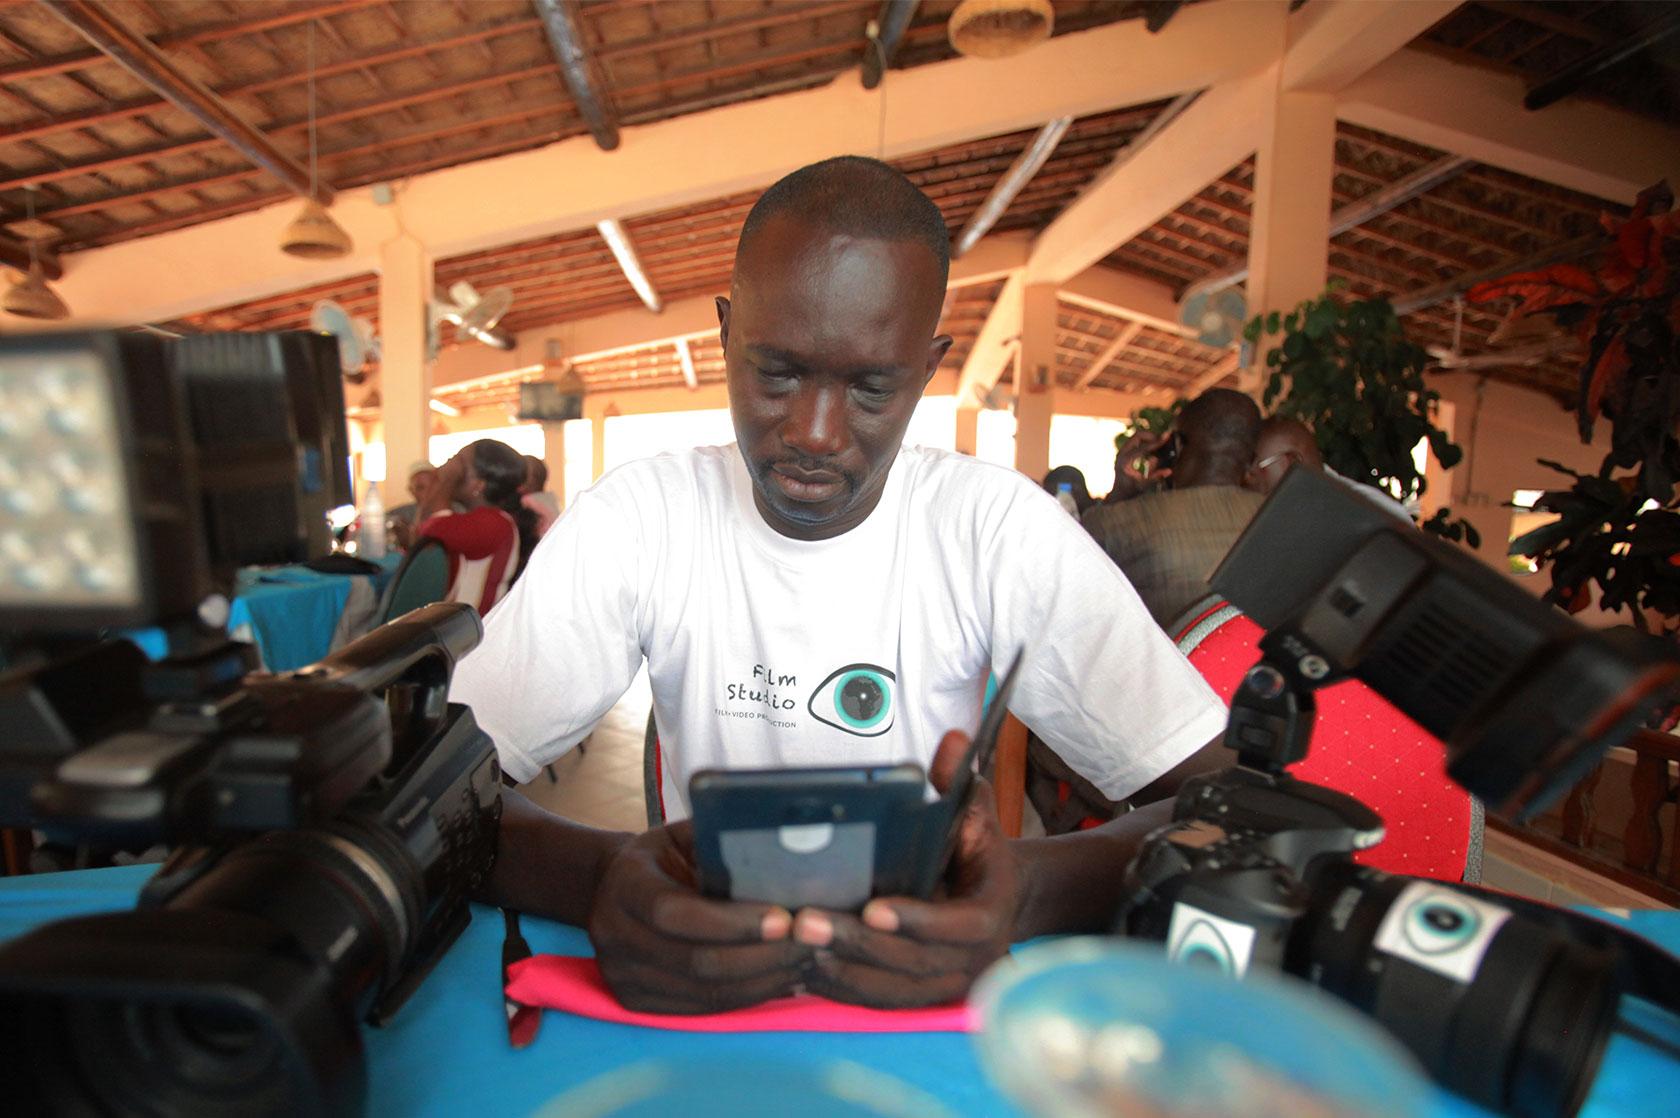 Cameraman Dakar Senegal Madyana-Studio